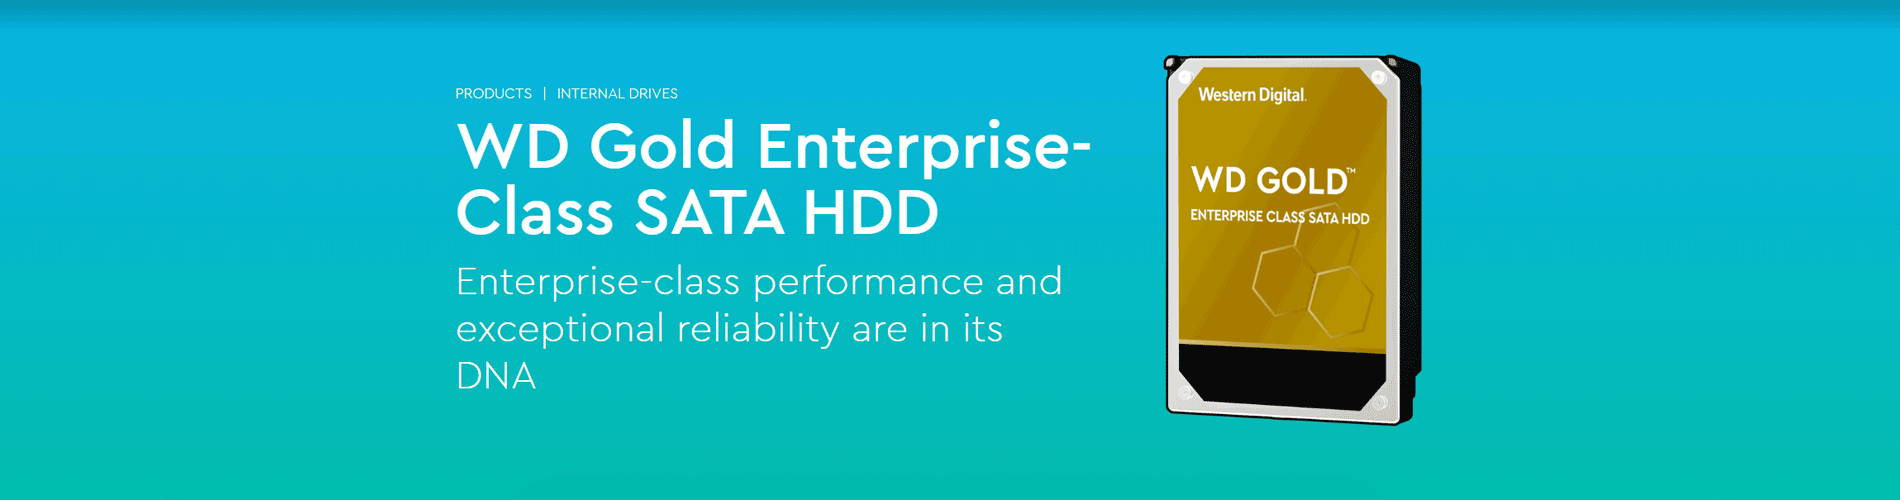 WD Gold Enterprise-Class SATA HDD